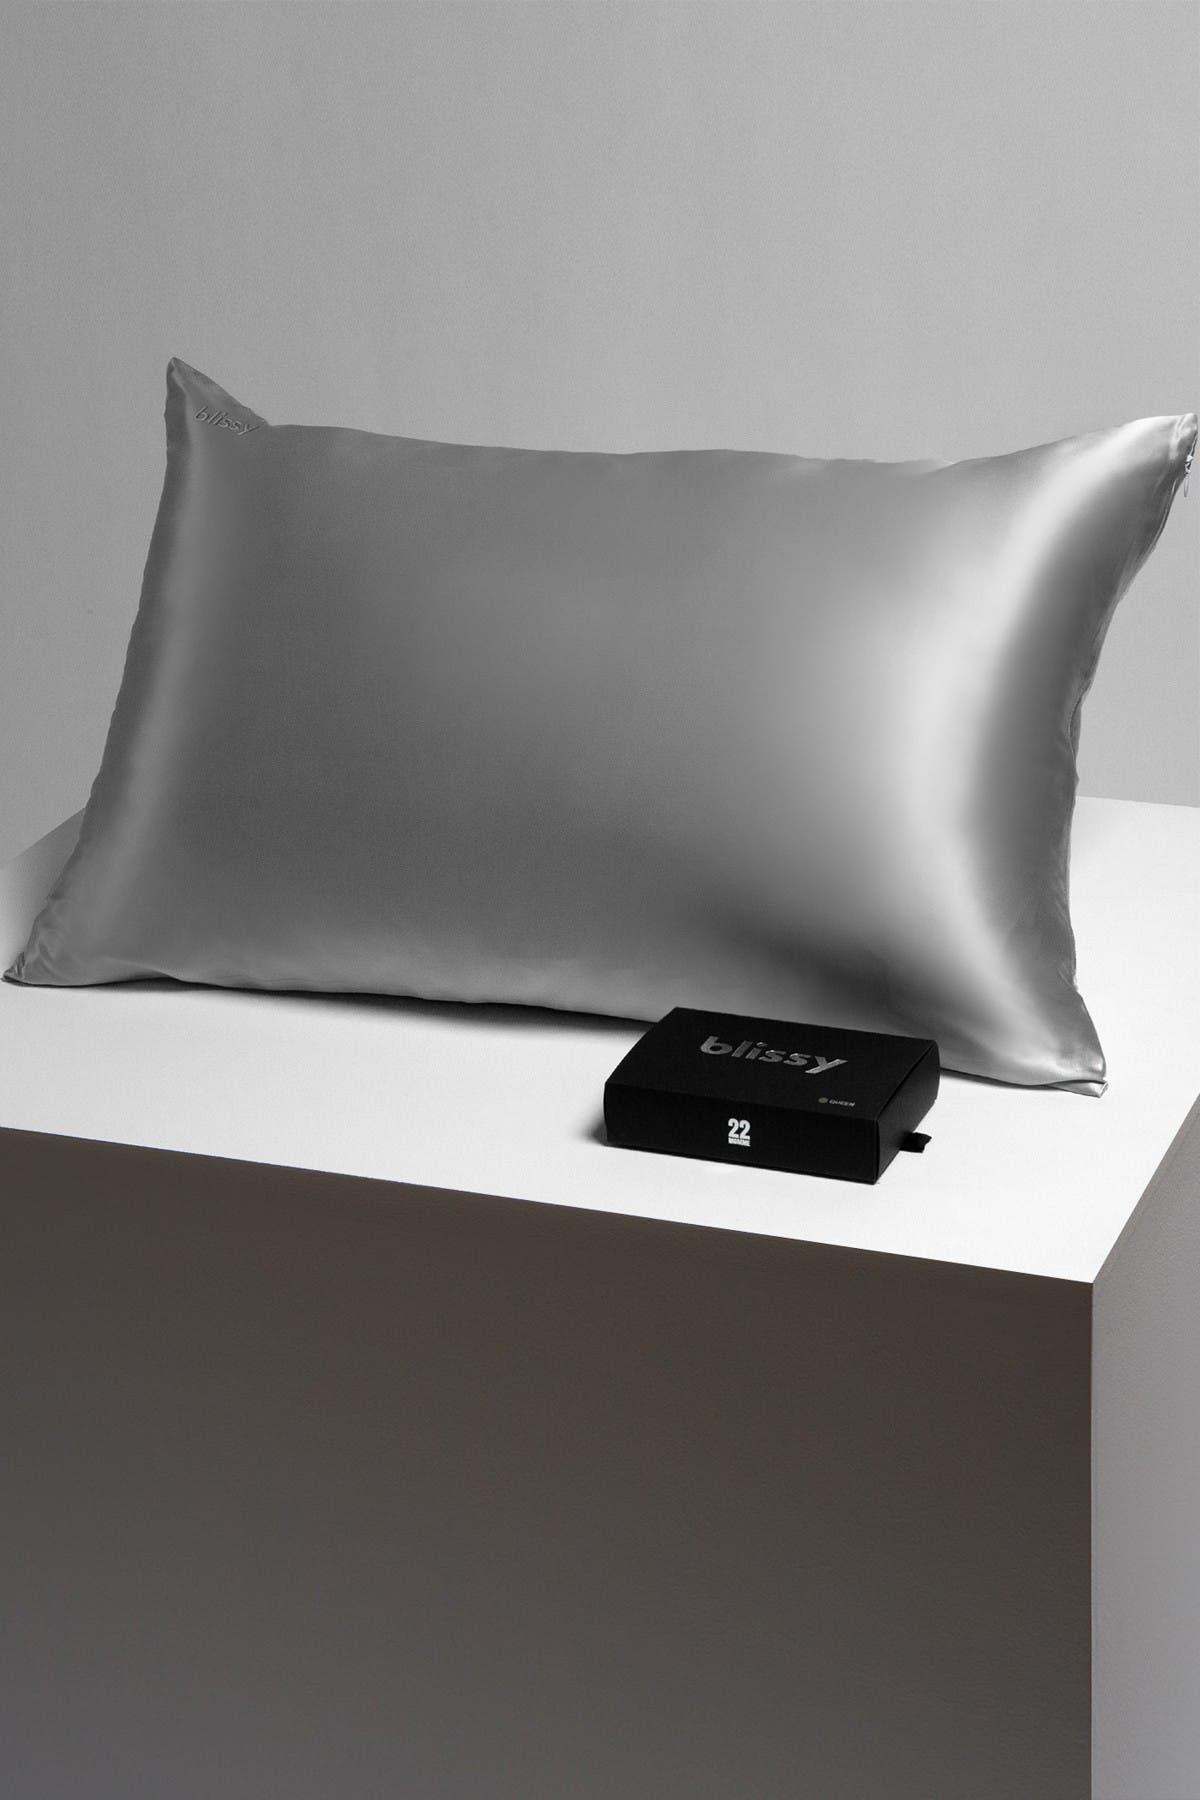 Image of BLISSY Mulberry Silk Standard Pillowcase